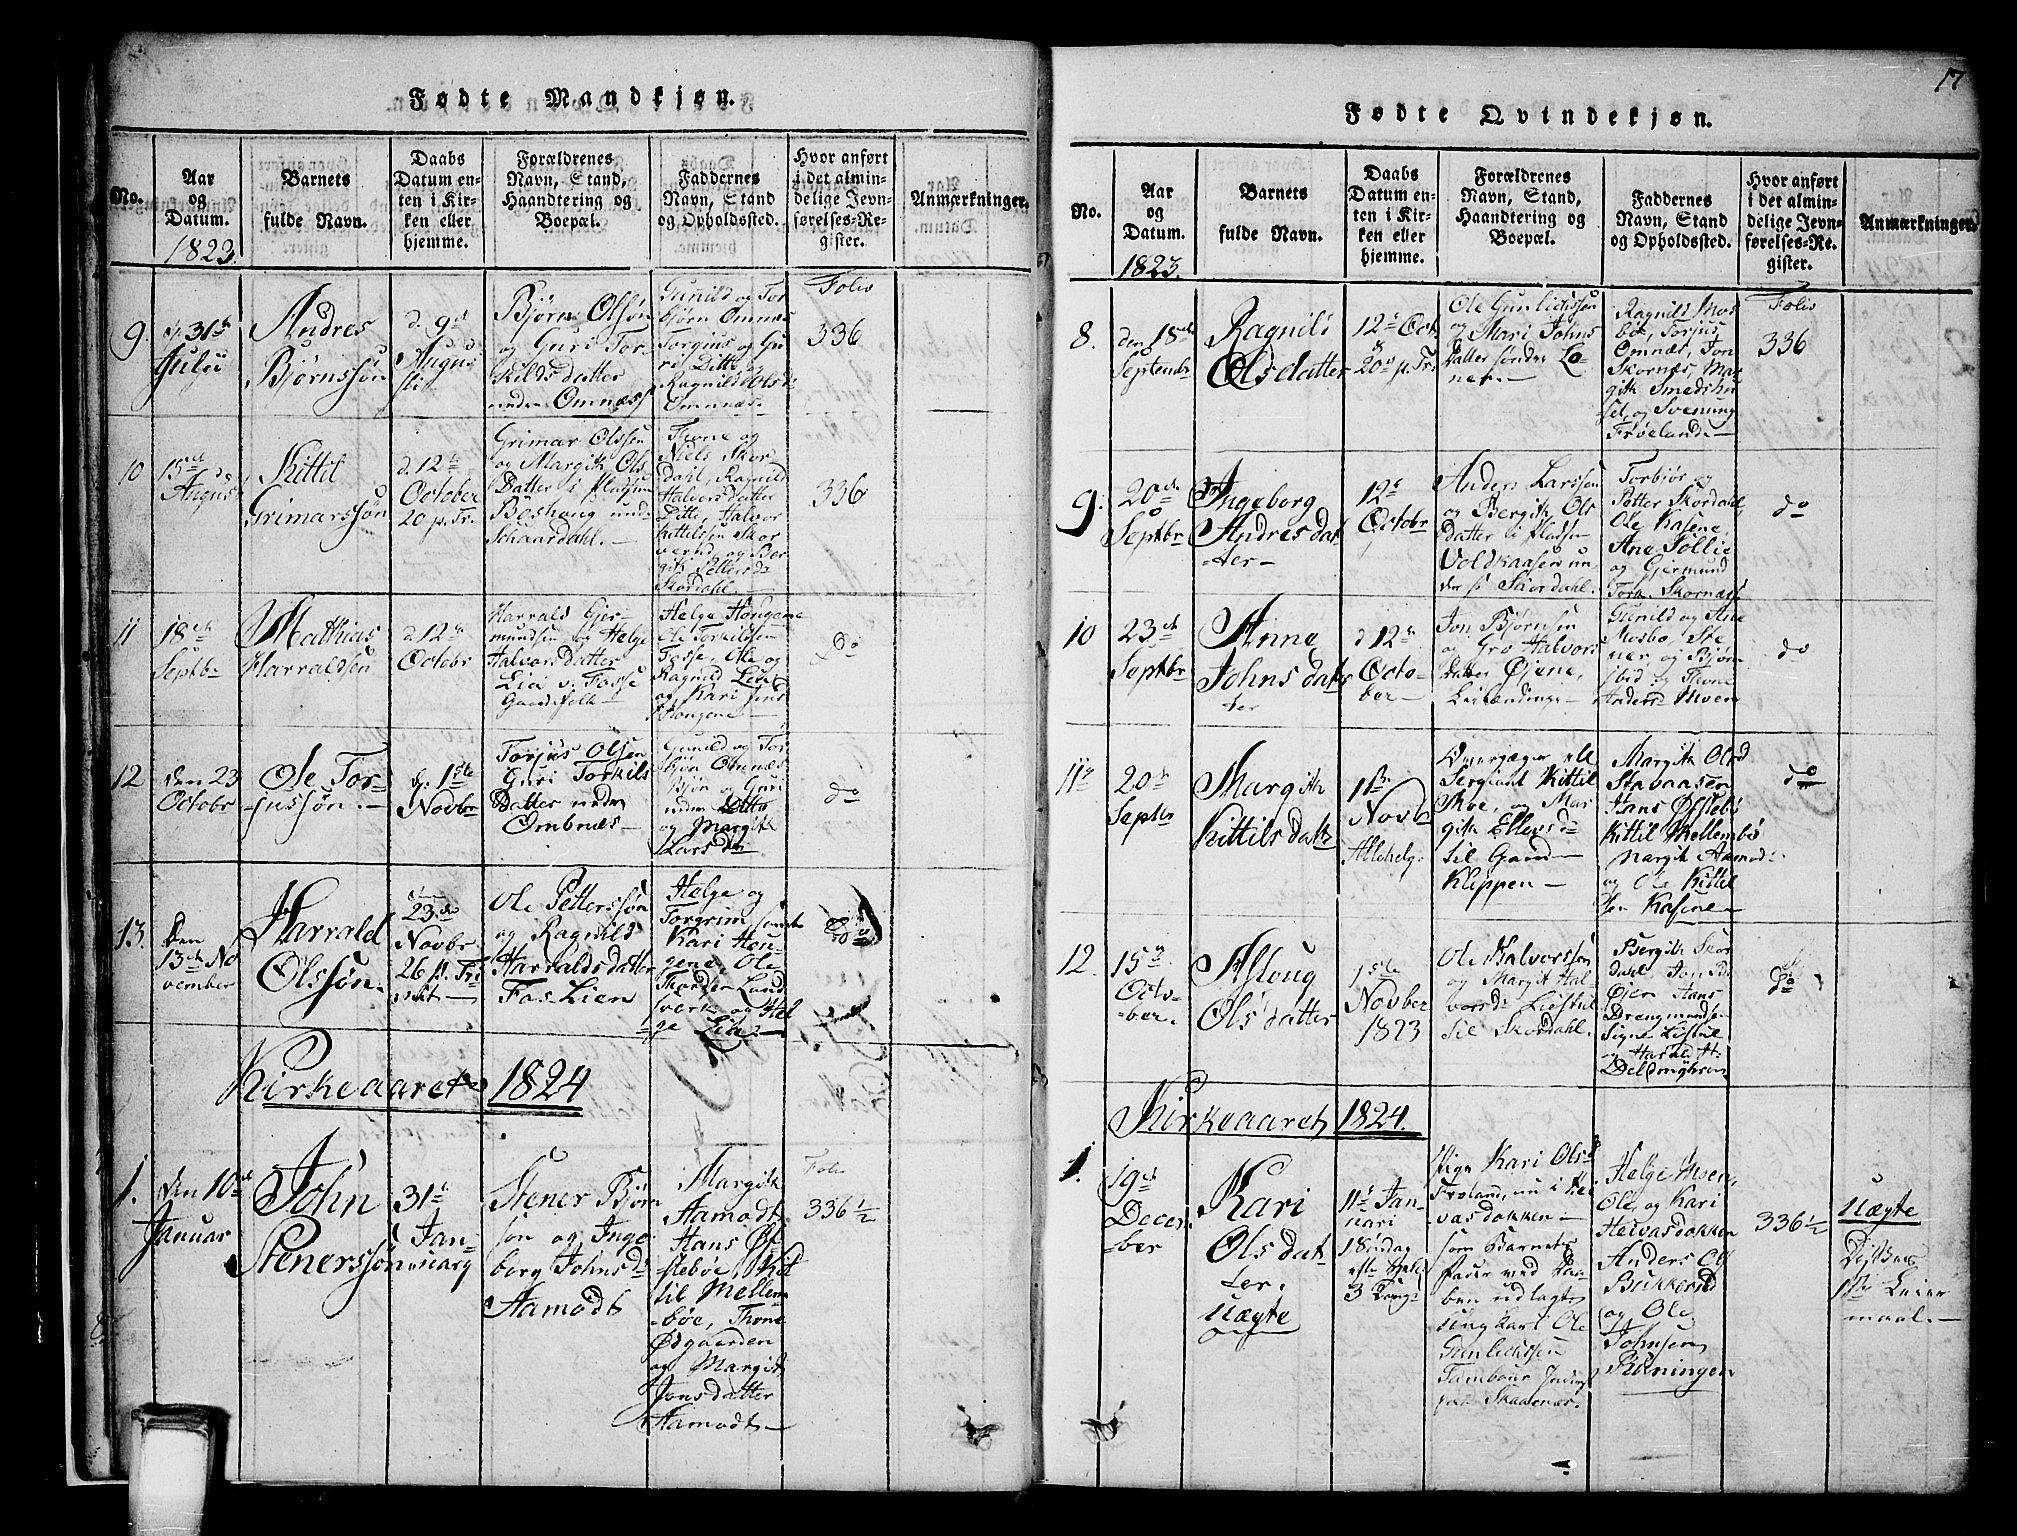 SAKO, Hjartdal kirkebøker, G/Gb/L0001: Klokkerbok nr. II 1, 1815-1842, s. 17